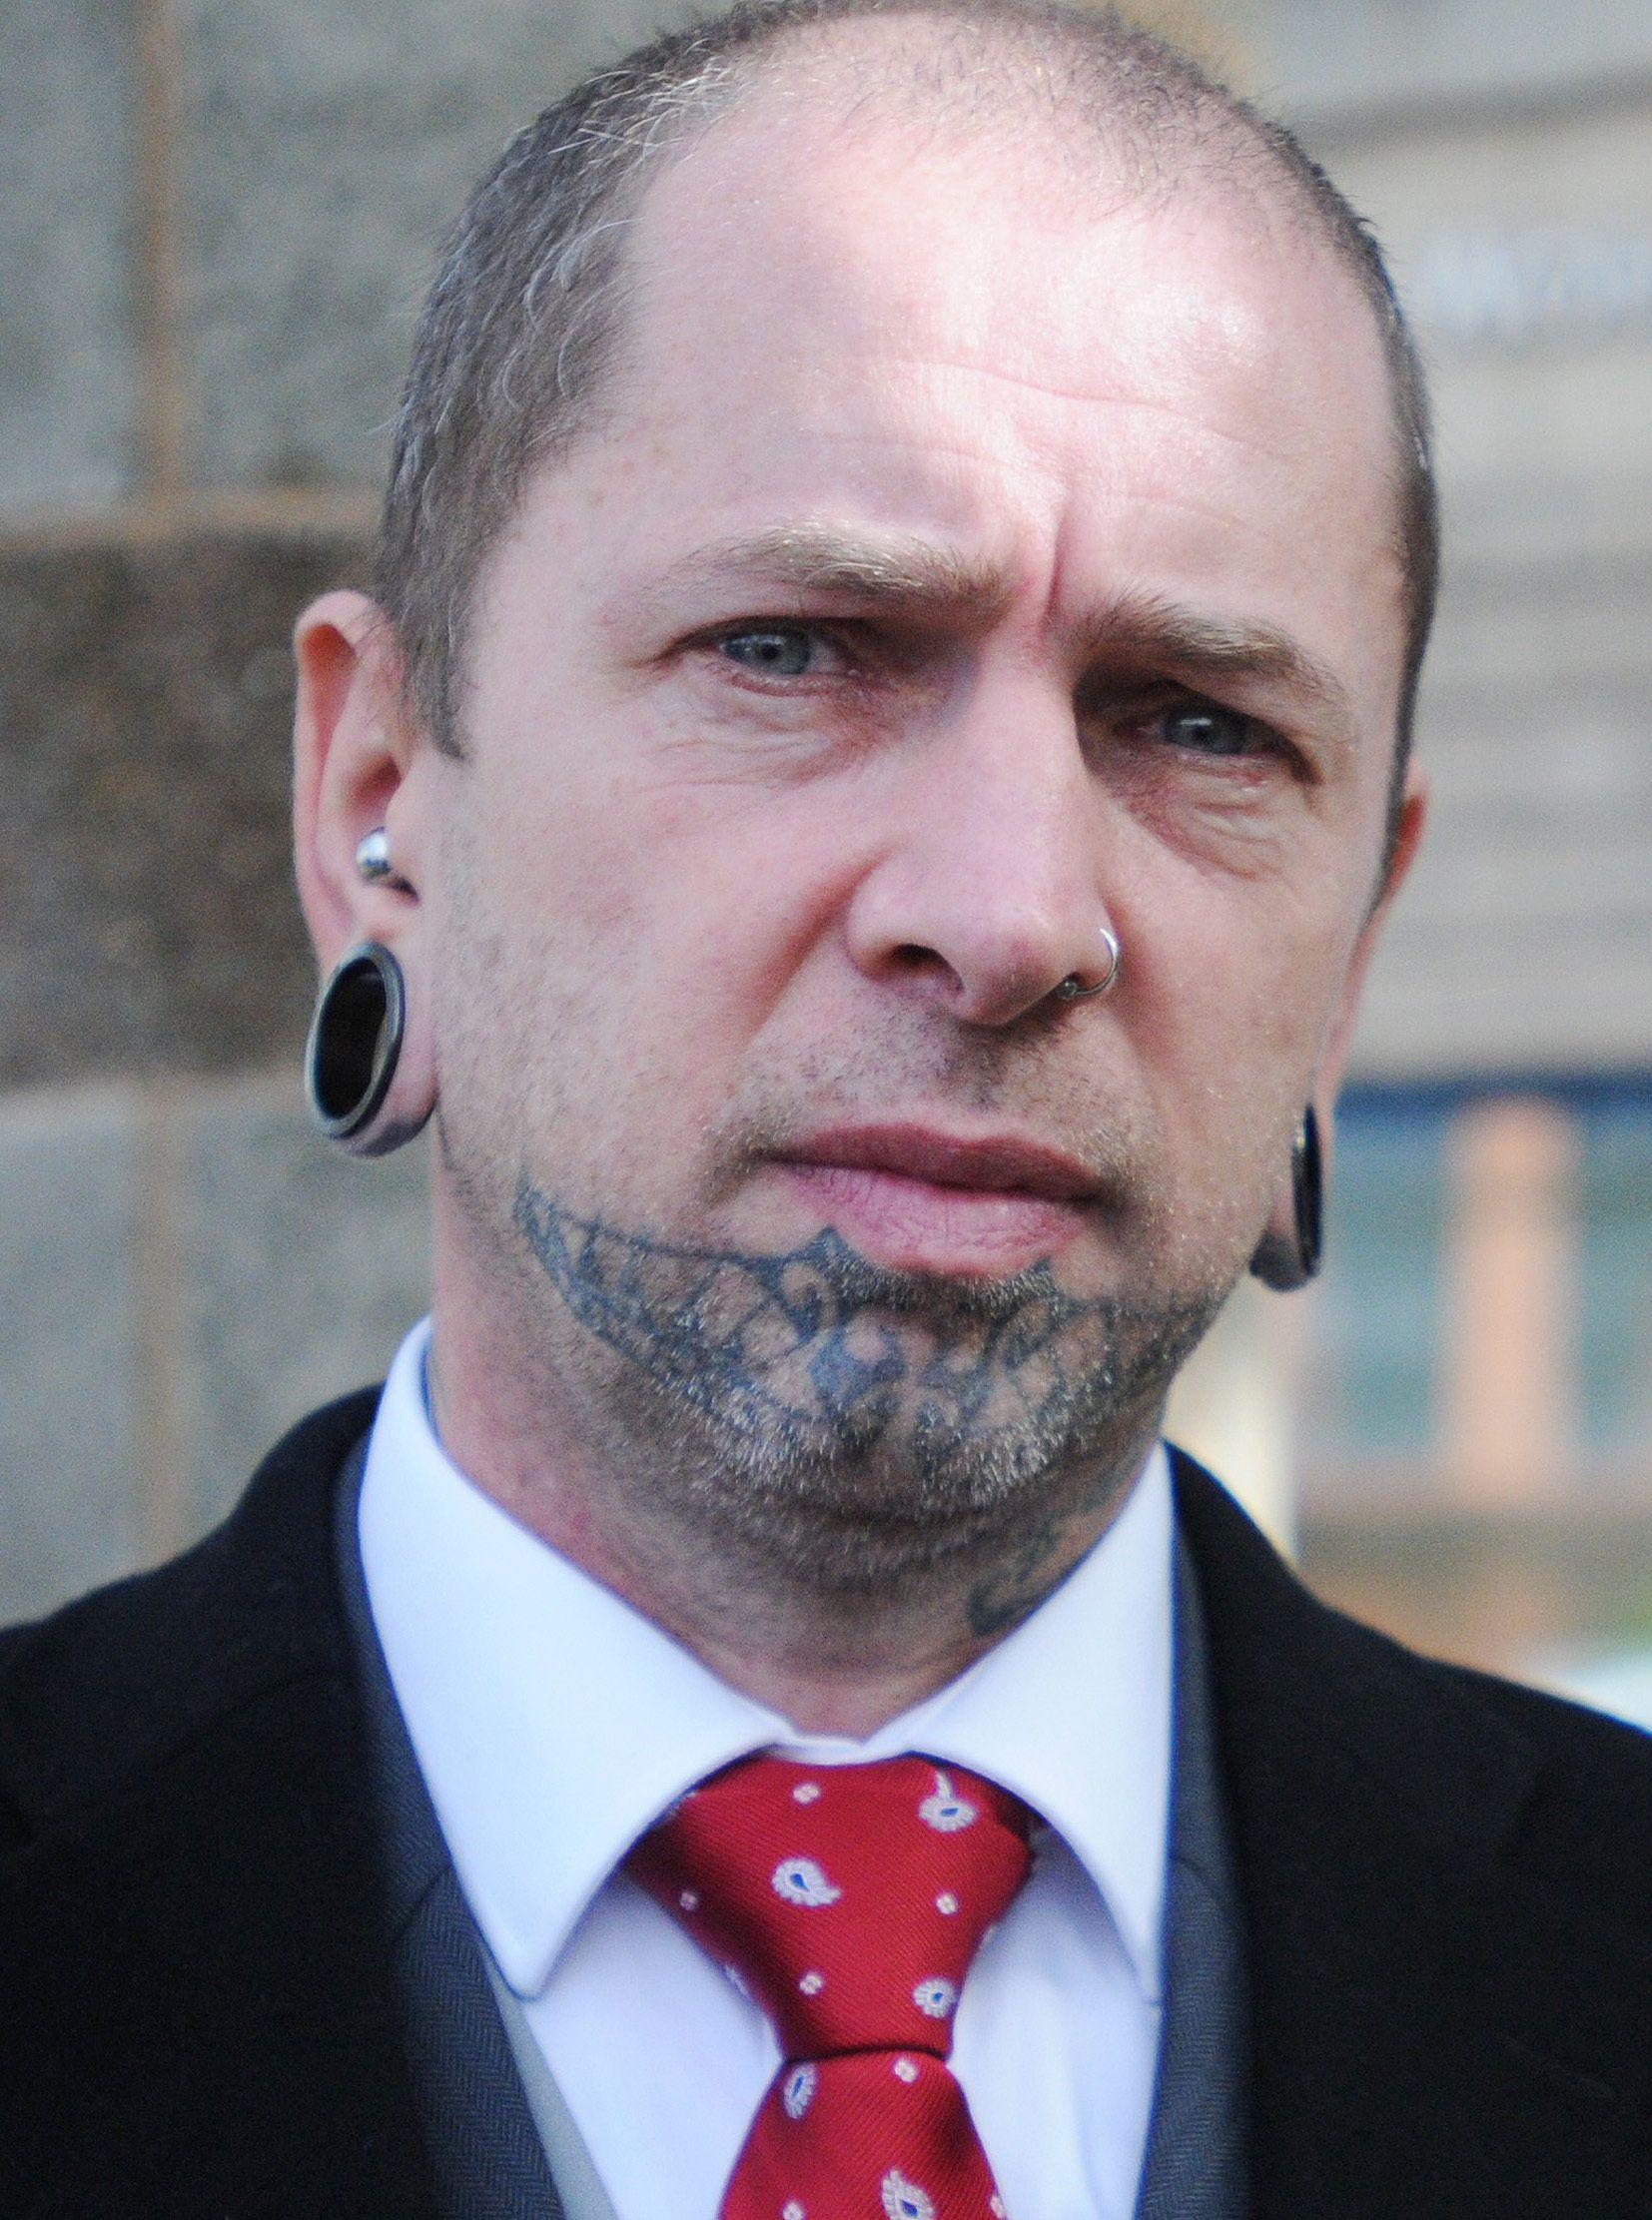 Brendan McCarthy will be sentenced on 21